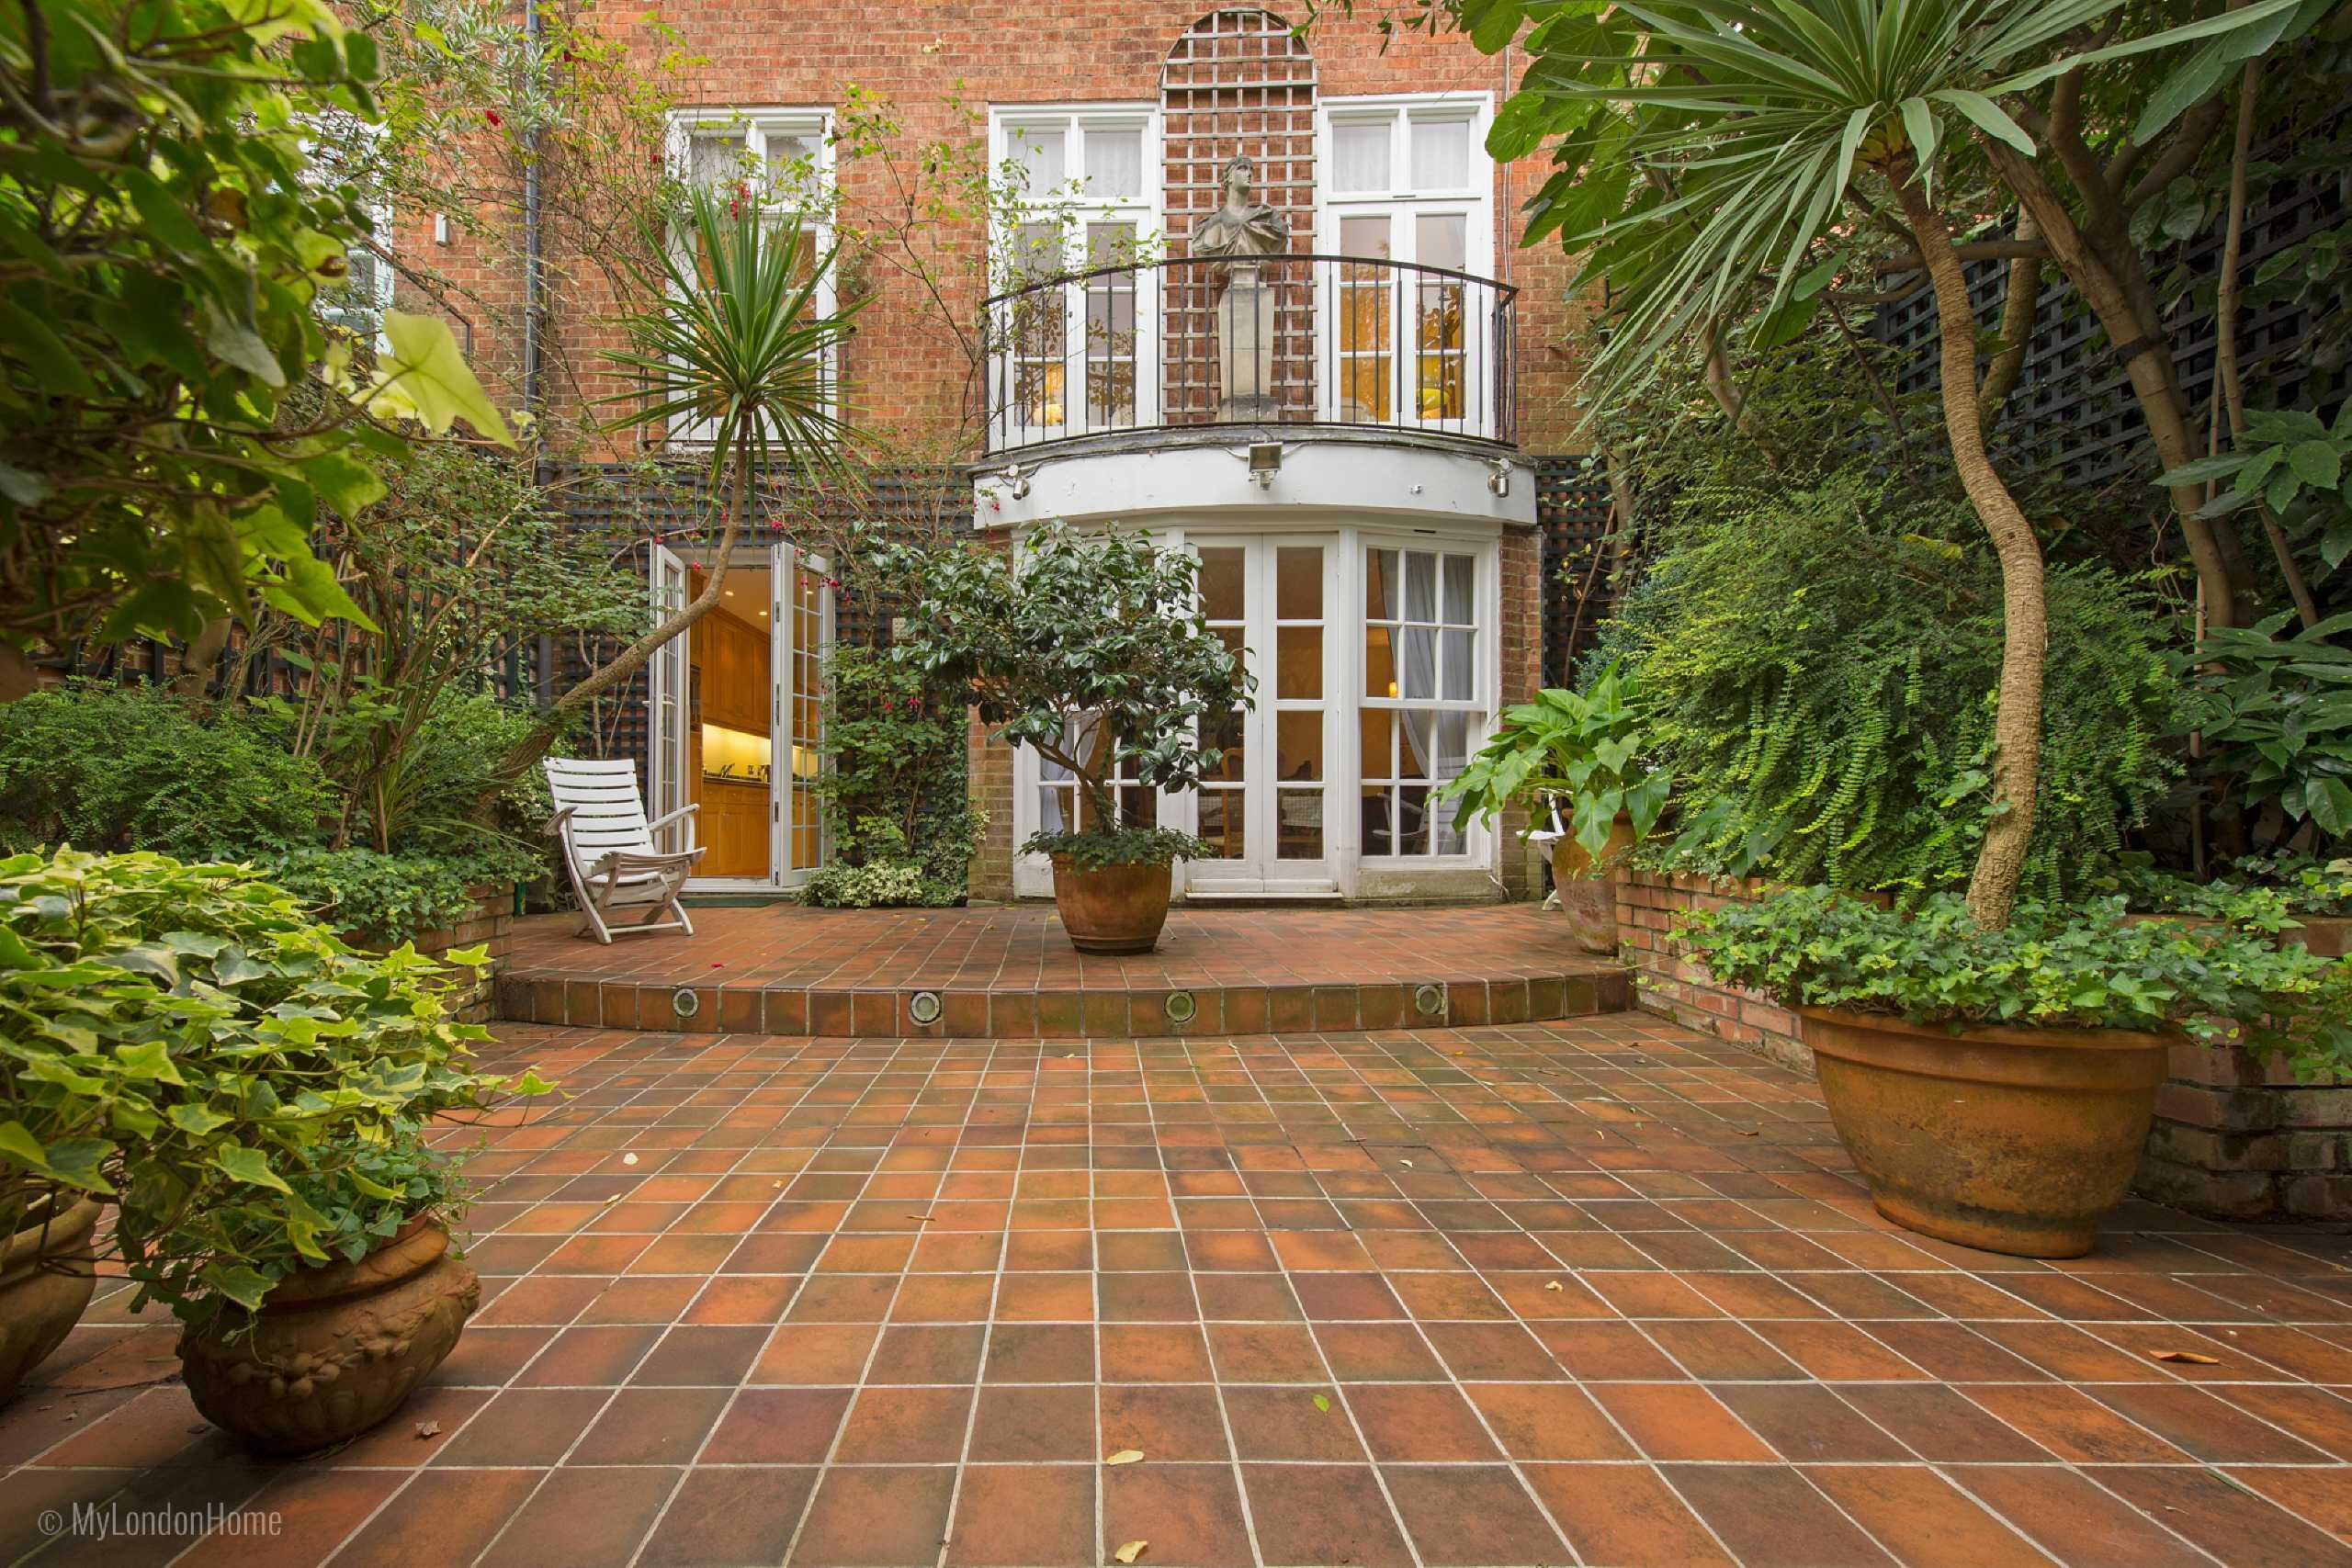 4 Bedrooms End Of Terrace House for sale in Moncorvo Close, Knightsbridge, London, SW7